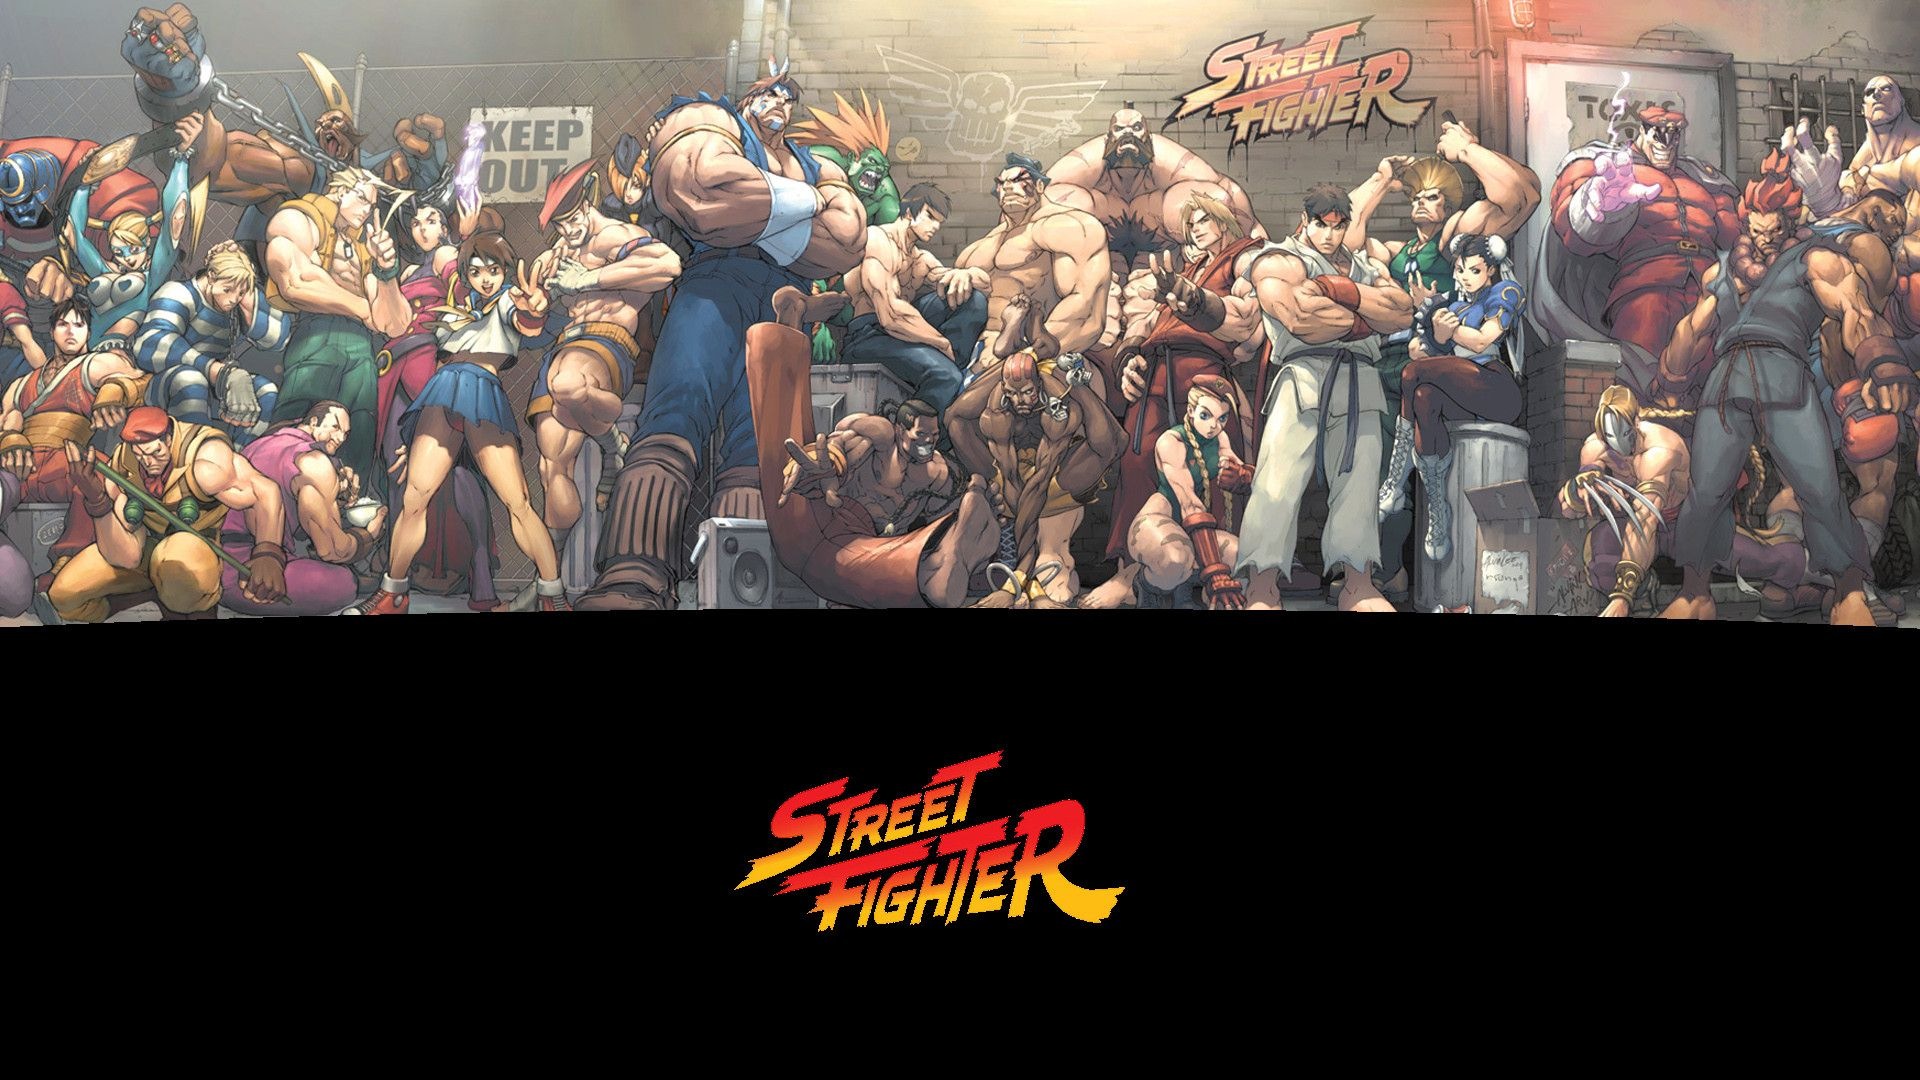 71 Street Fighter Wallpaper Hd On Wallpapersafari